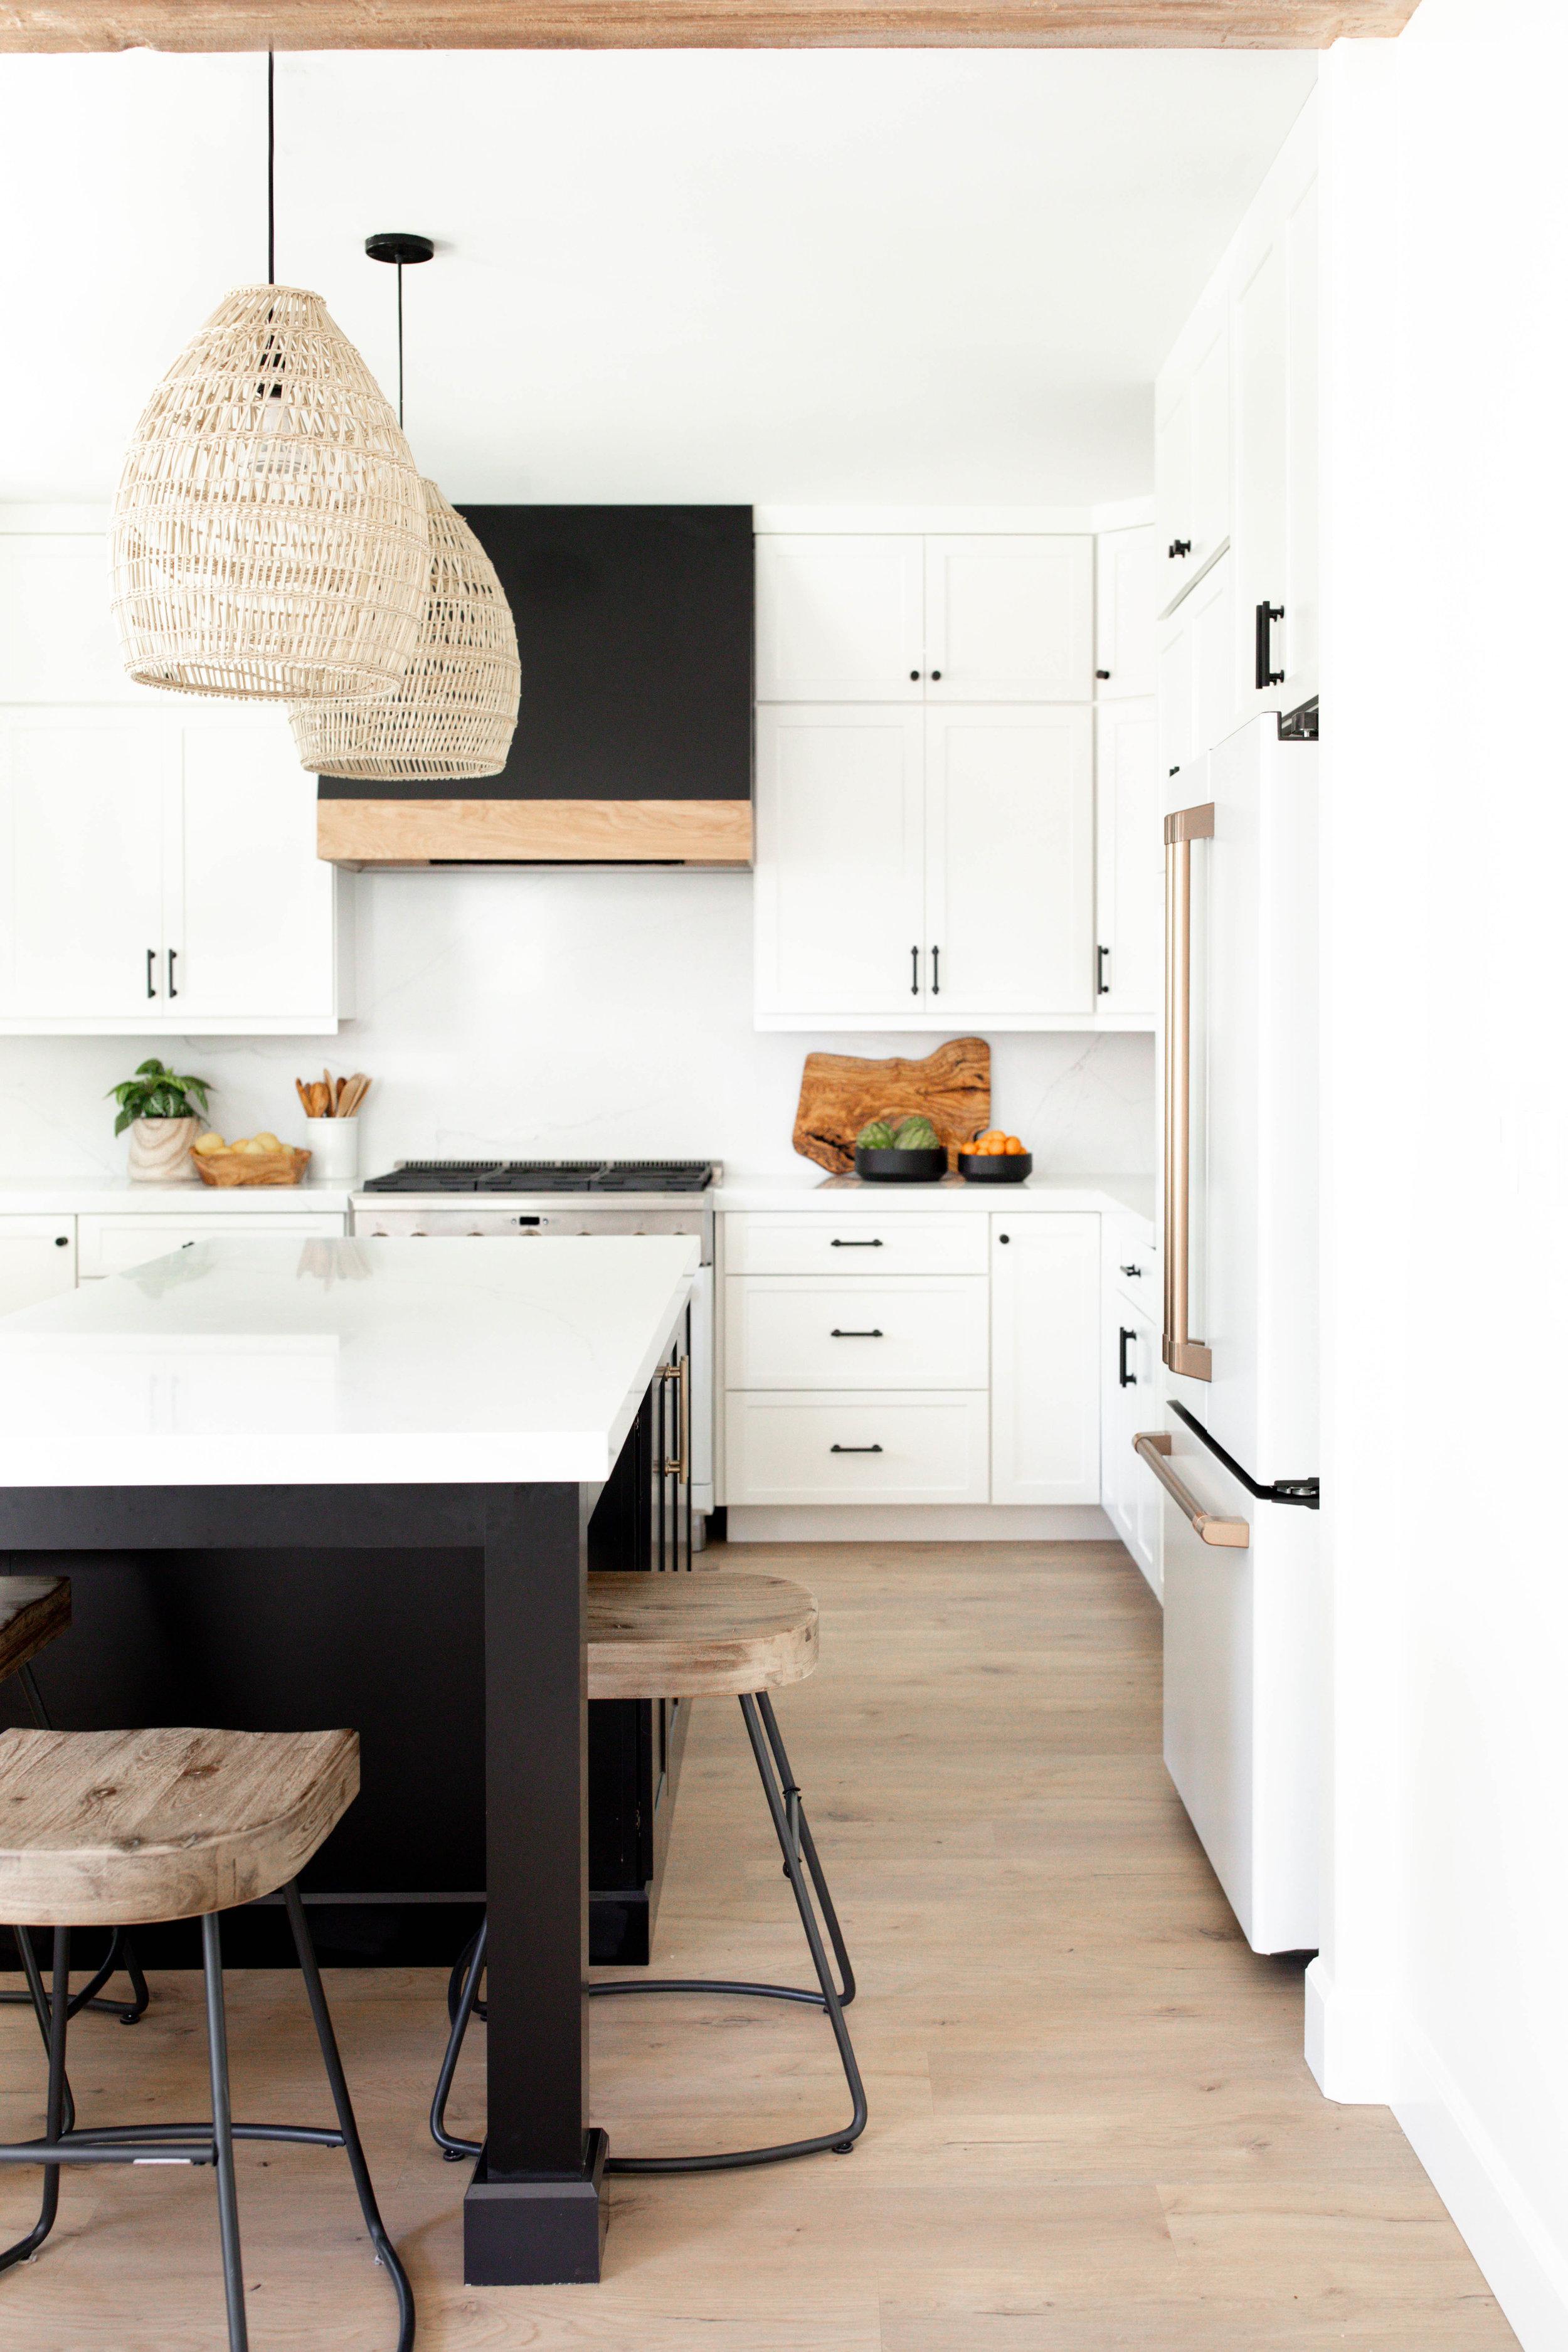 Morgan_Mullen_Design_Blue_Water_San_Diego_Interior_Designer_The_Zamudios-31.jpg